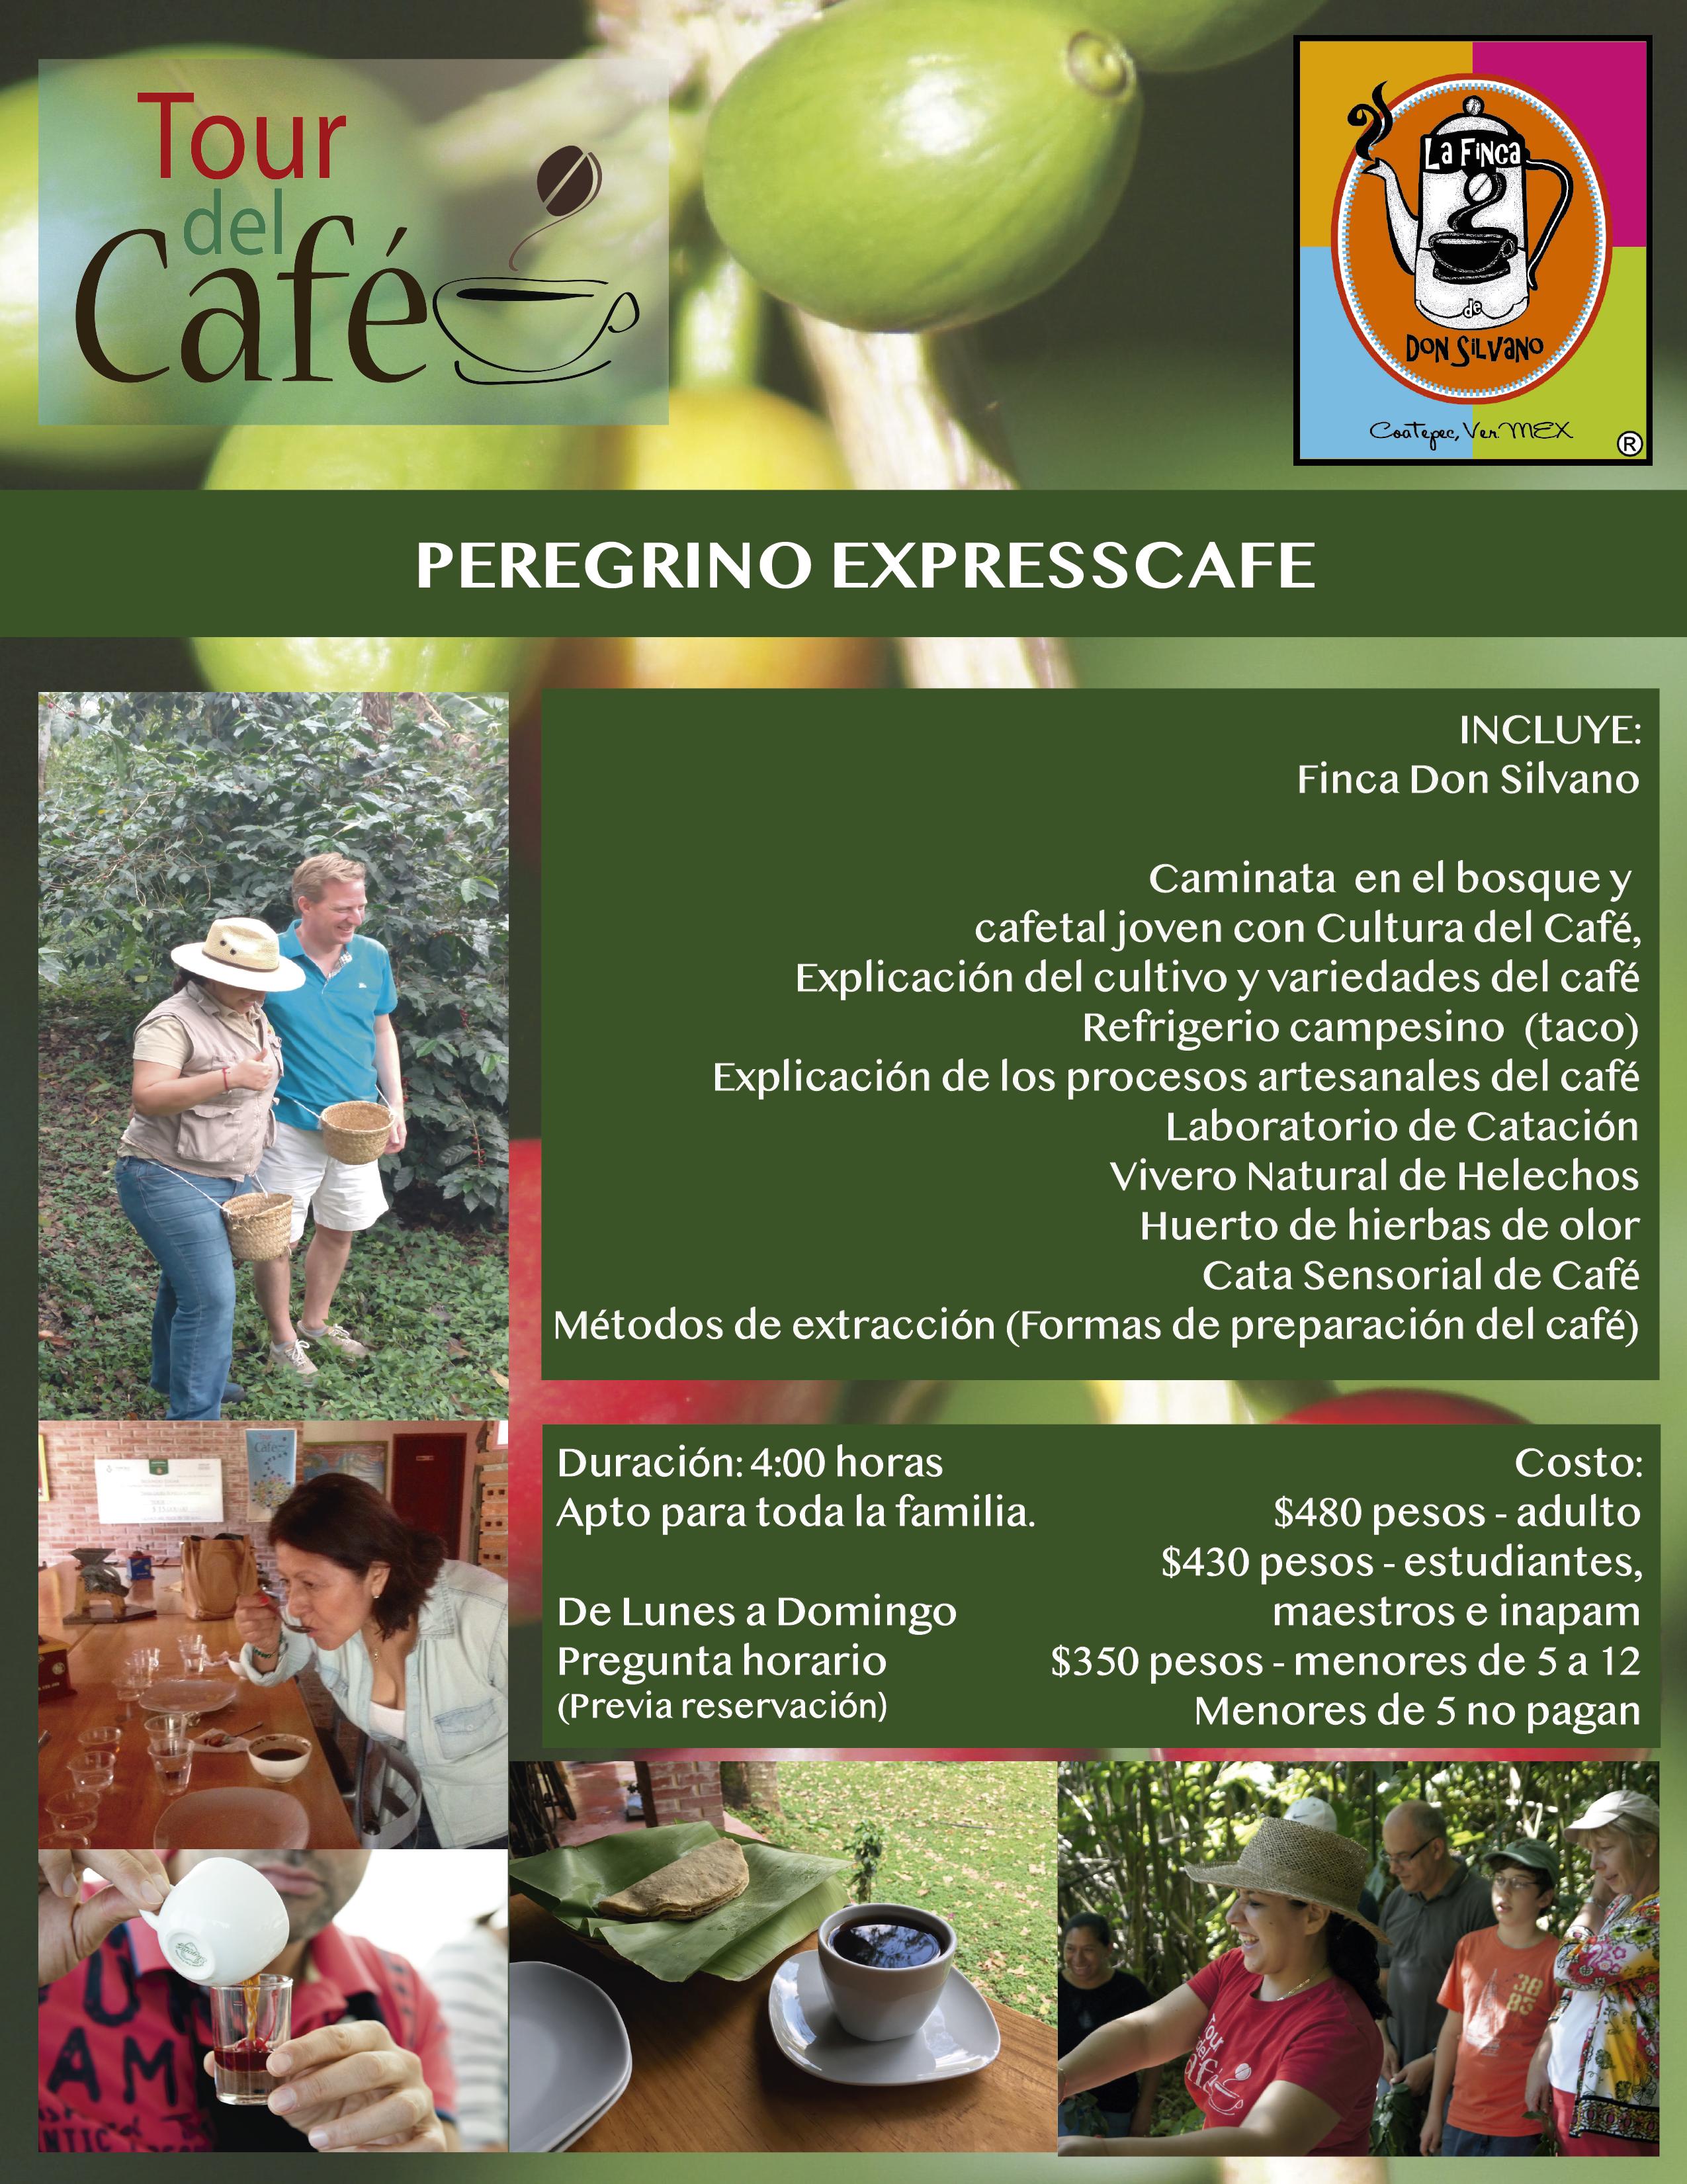 #PEREGRINOEXPRESSCAFE #TOURDELCAFE #COATEPEC